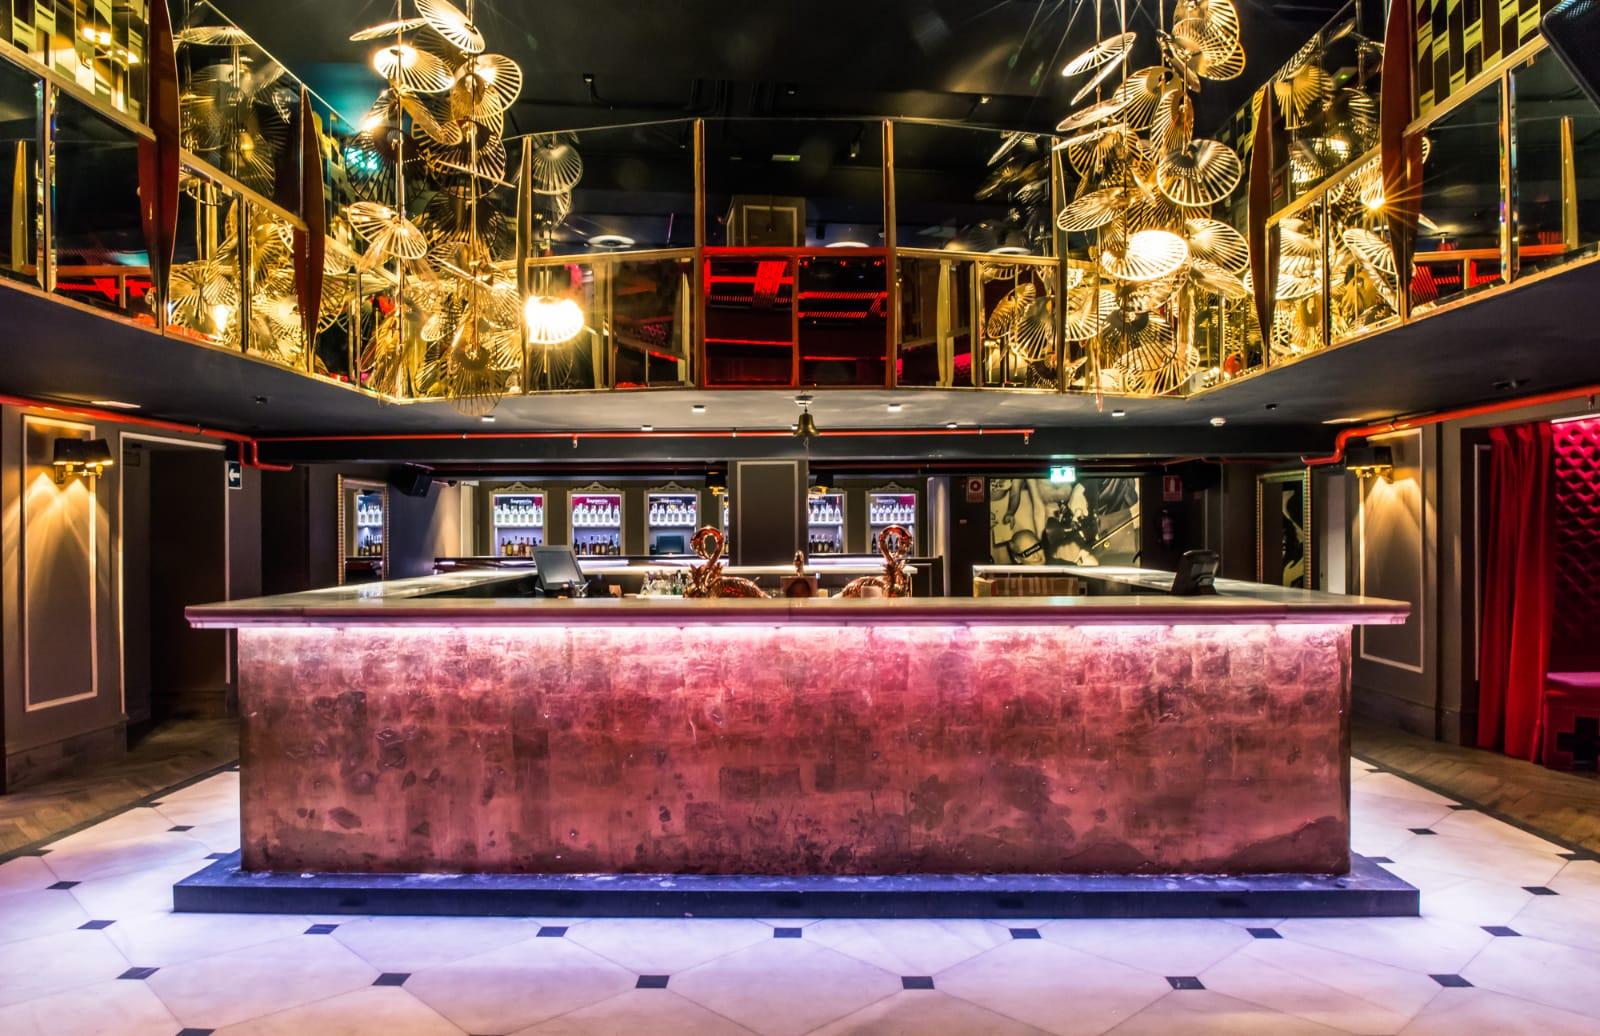 diseño-fabricacion-montaje-instalacion-barras-bares-discotecas-pubs-clubs-acero-inox-inoxidable-maquinaria-cocteleria-cocktail-cocteles-fabricantes-madrid-leds-eventos-fijas-portatiles-madrid